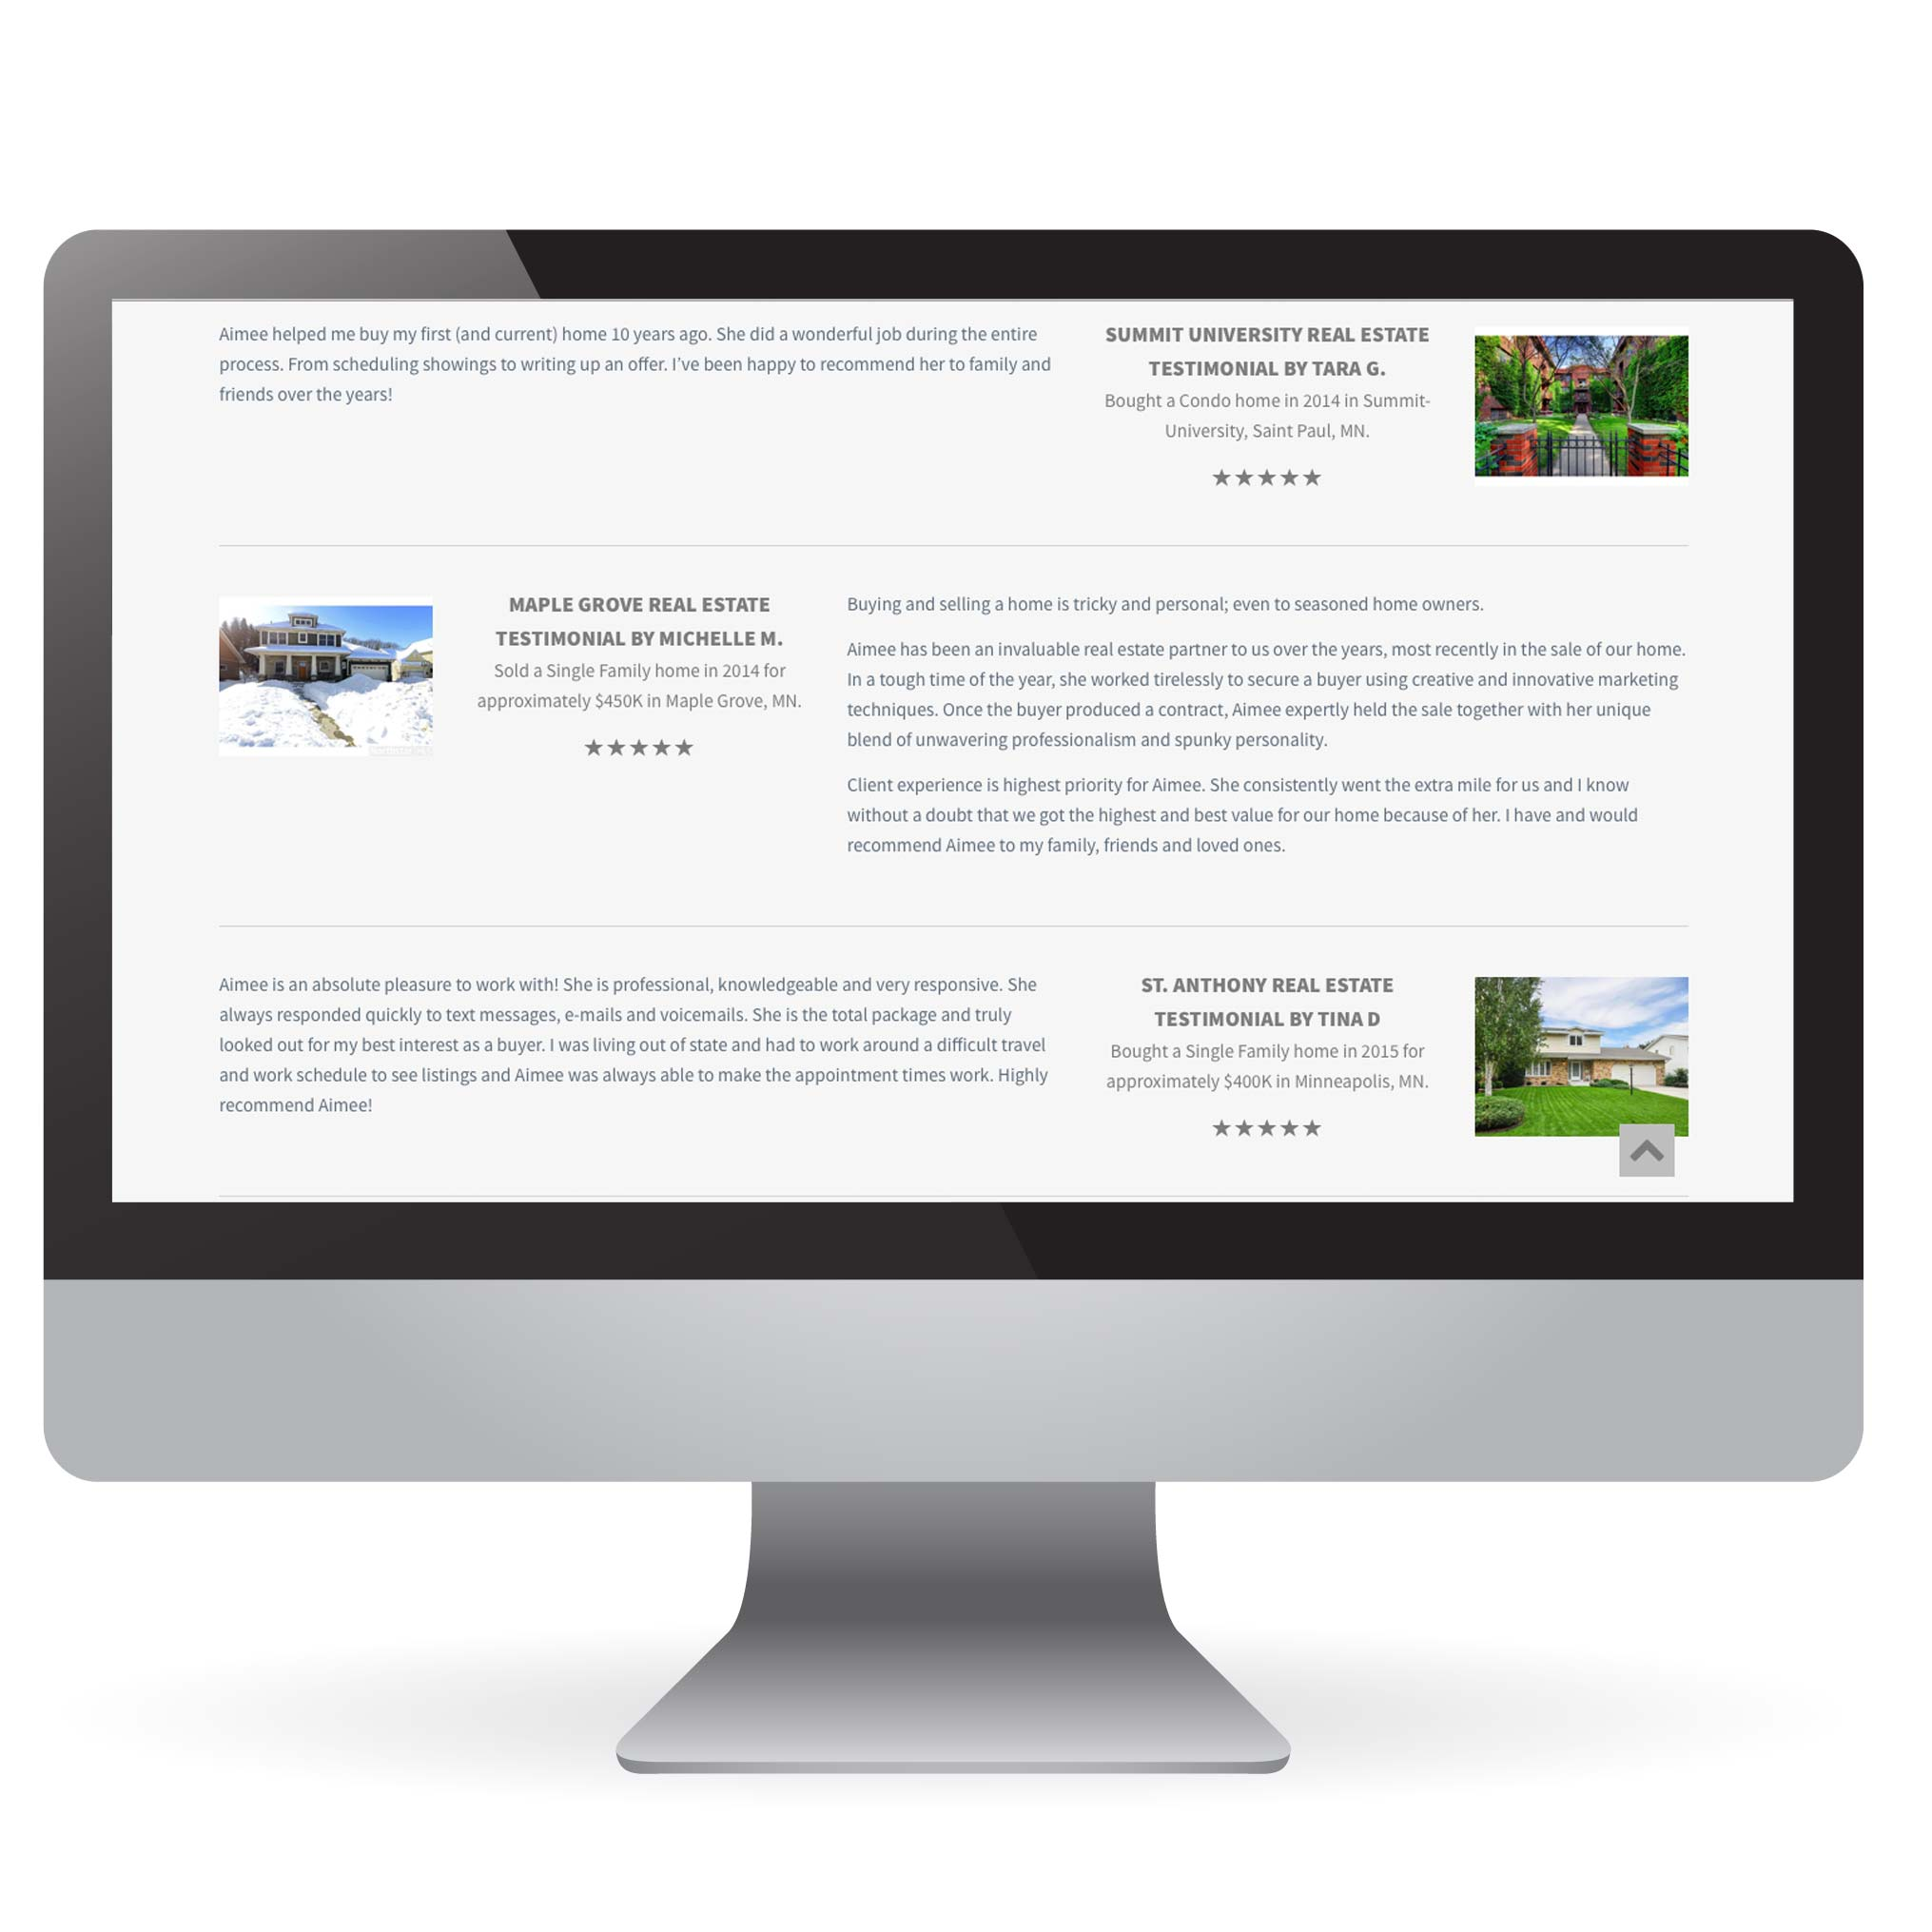 Real Estate testimonials on IDX Website Design